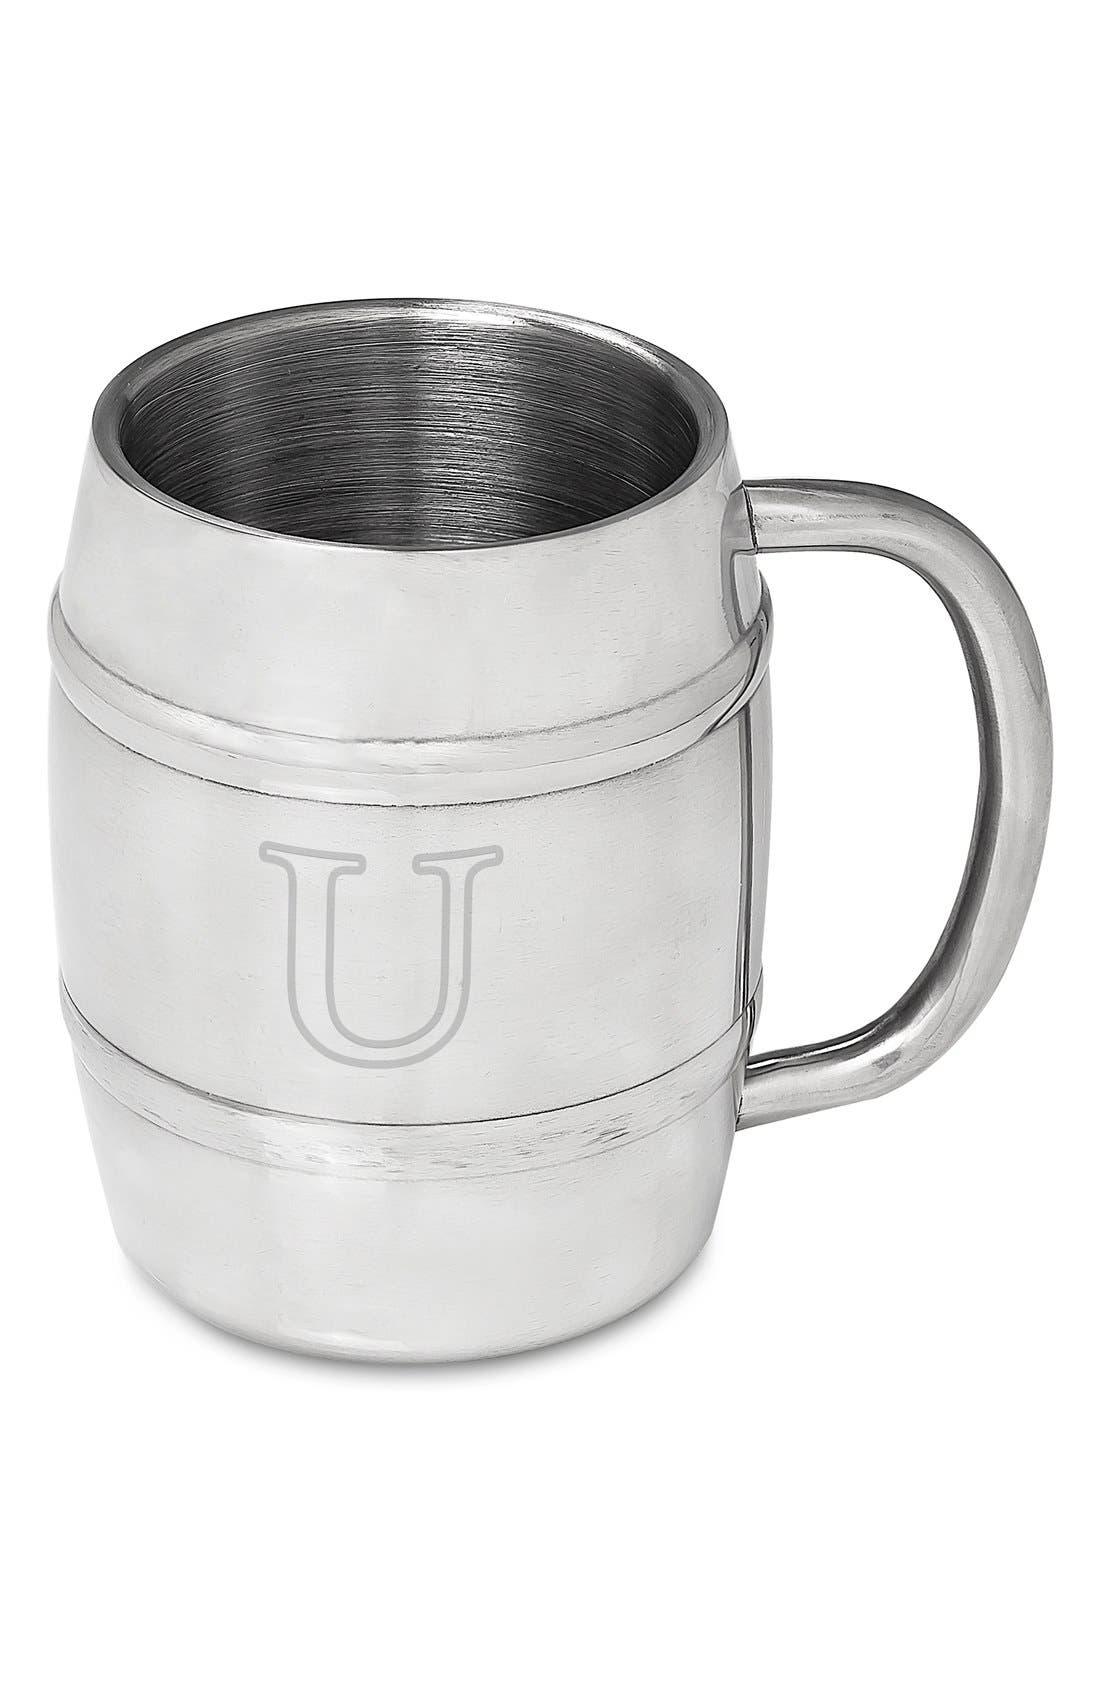 Monogram Stainless Steel Keg Mug,                             Main thumbnail 22, color,